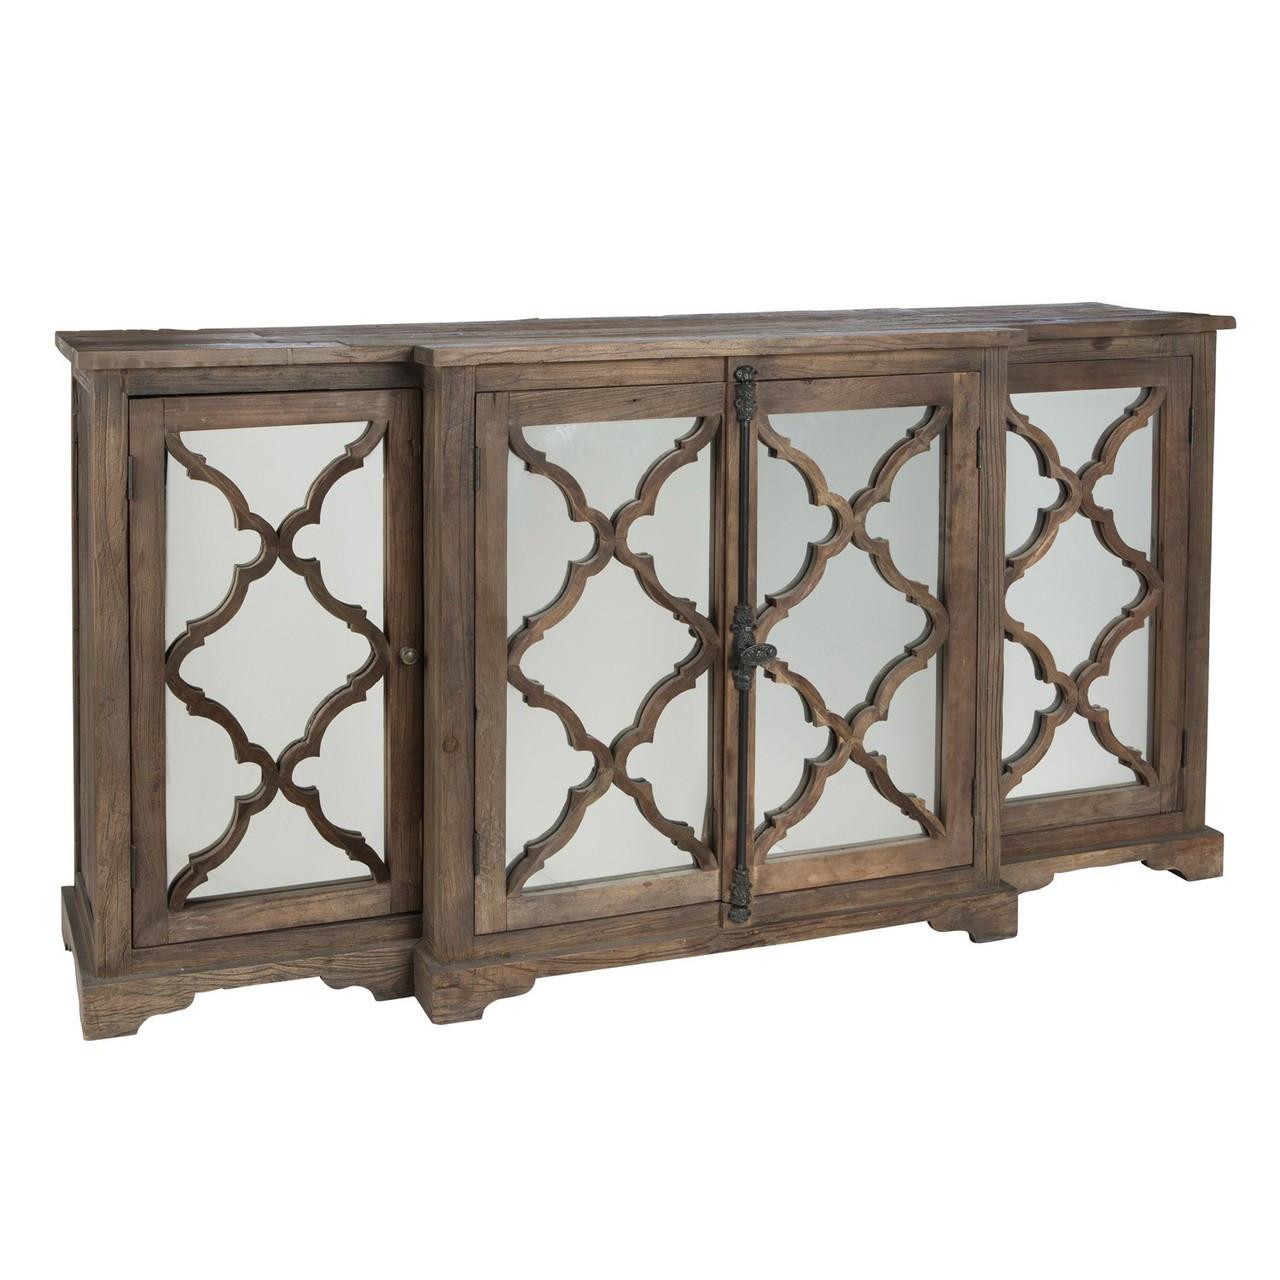 Aidan Gray Furniture Lowery Buffet Sideboard with 4 Glass Paneled Door - Lowery Buffet Sideboard With 4 Glass Paneled Door Zin Home